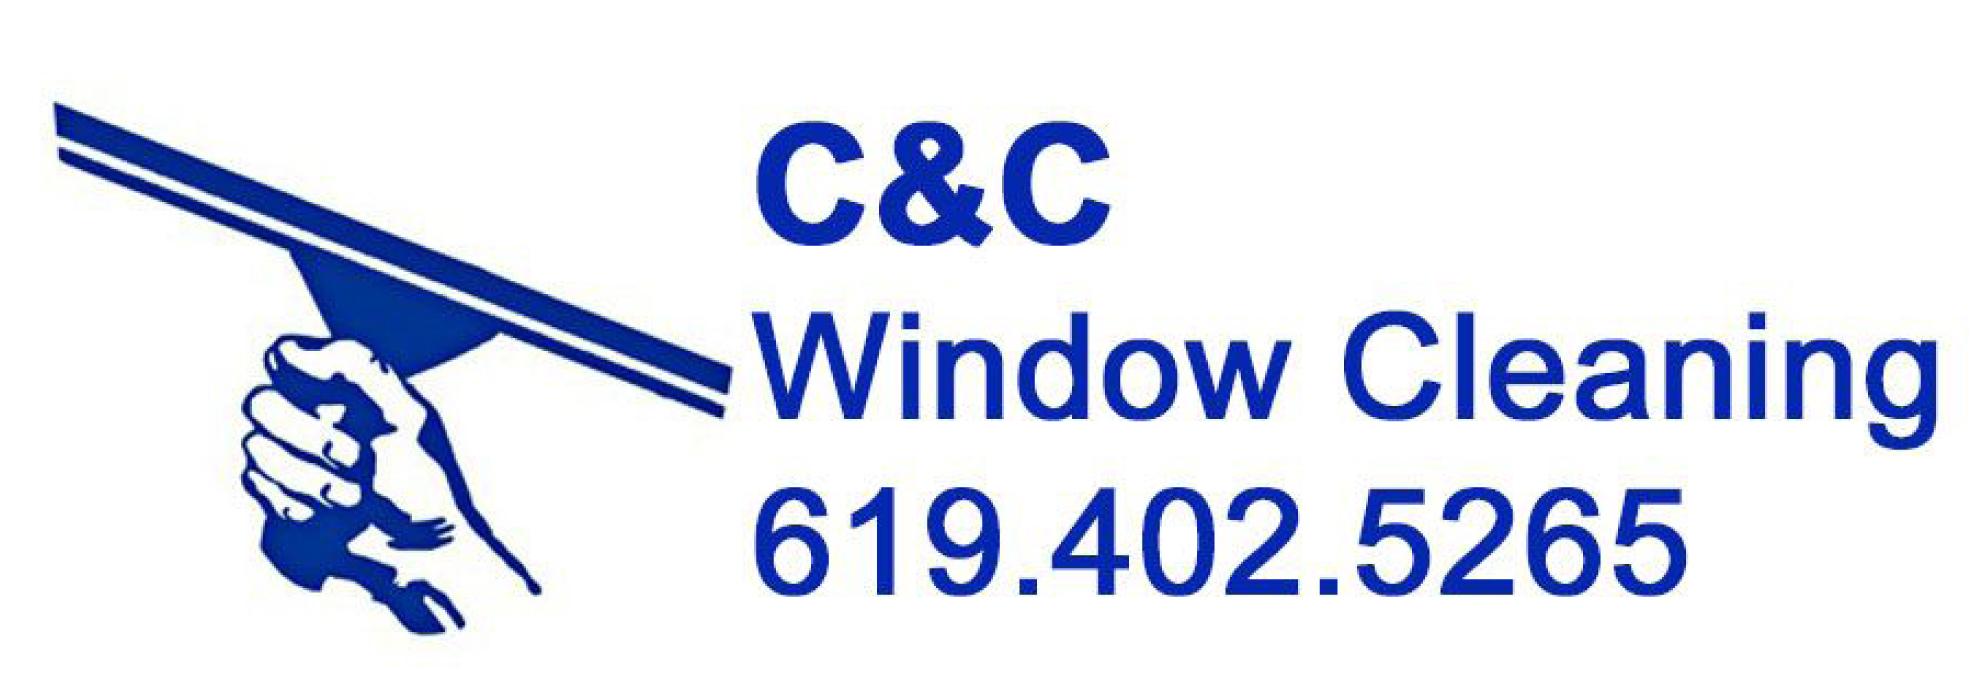 C C Window Cleaning